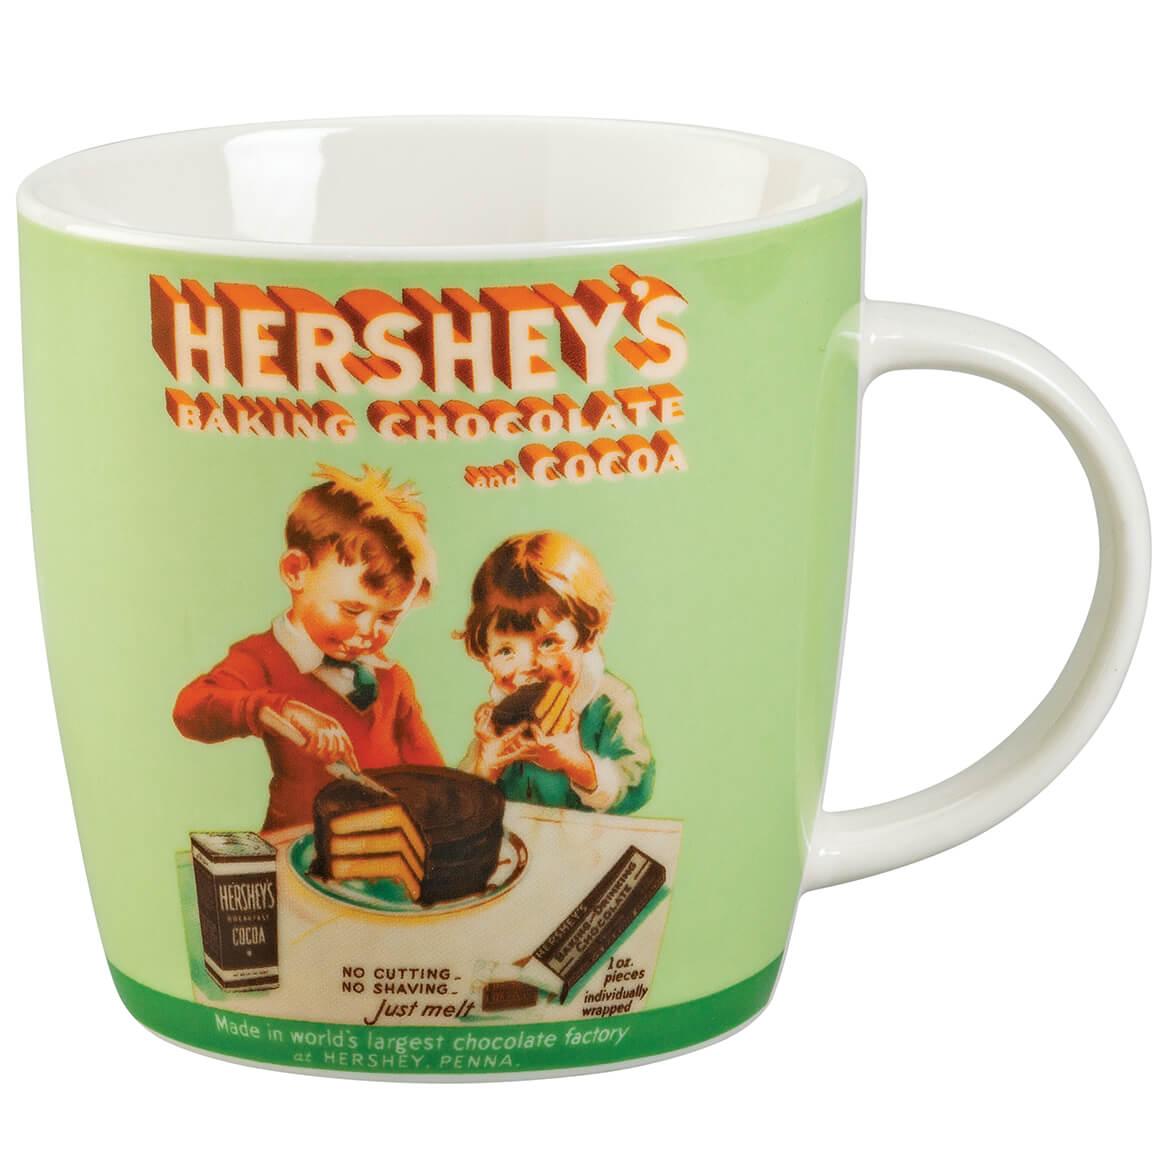 Hershey's Baking Cocoa Vintage Mug-370901